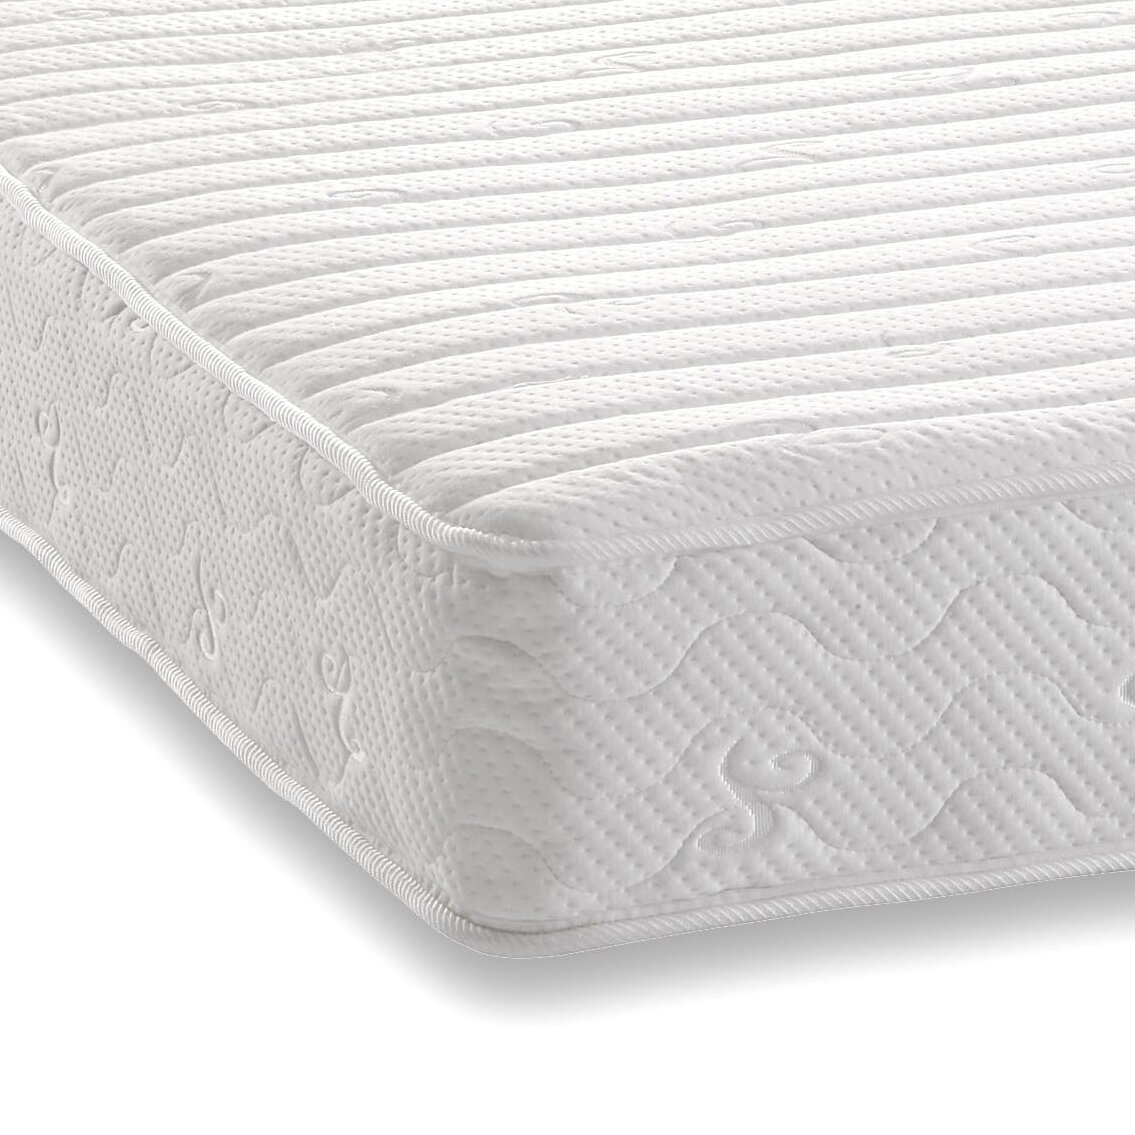 signature sleep signature sleep contour 8 medium hybrid mattress reviews wayfair. Black Bedroom Furniture Sets. Home Design Ideas